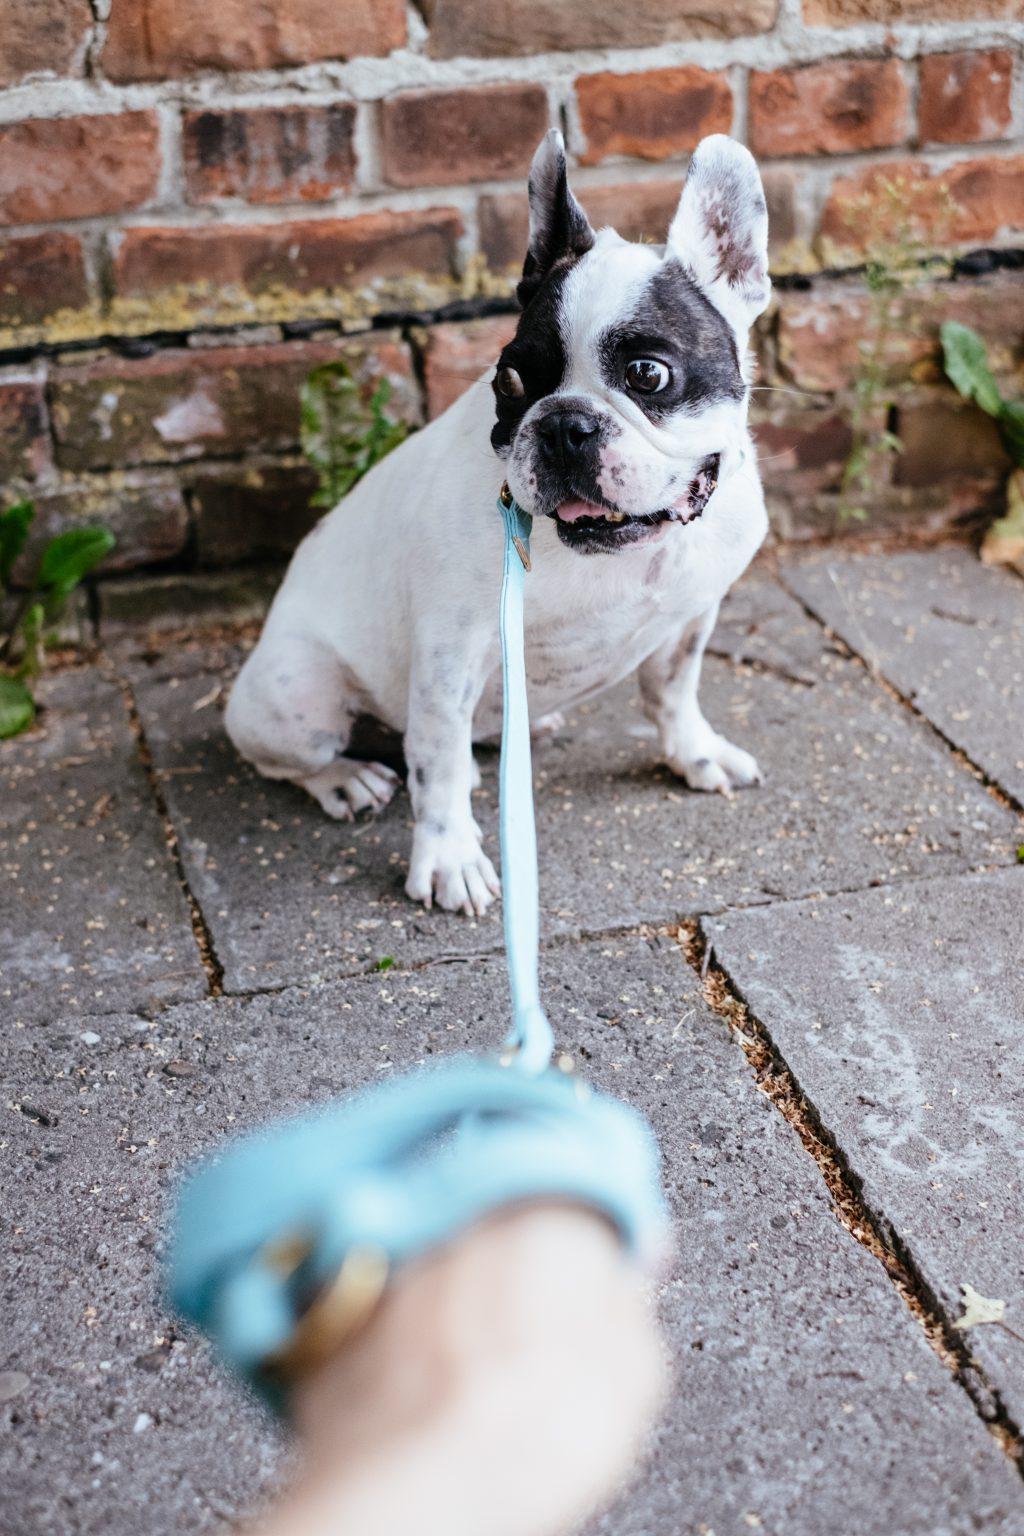 French Bulldog on a leash 6 - free stock photo